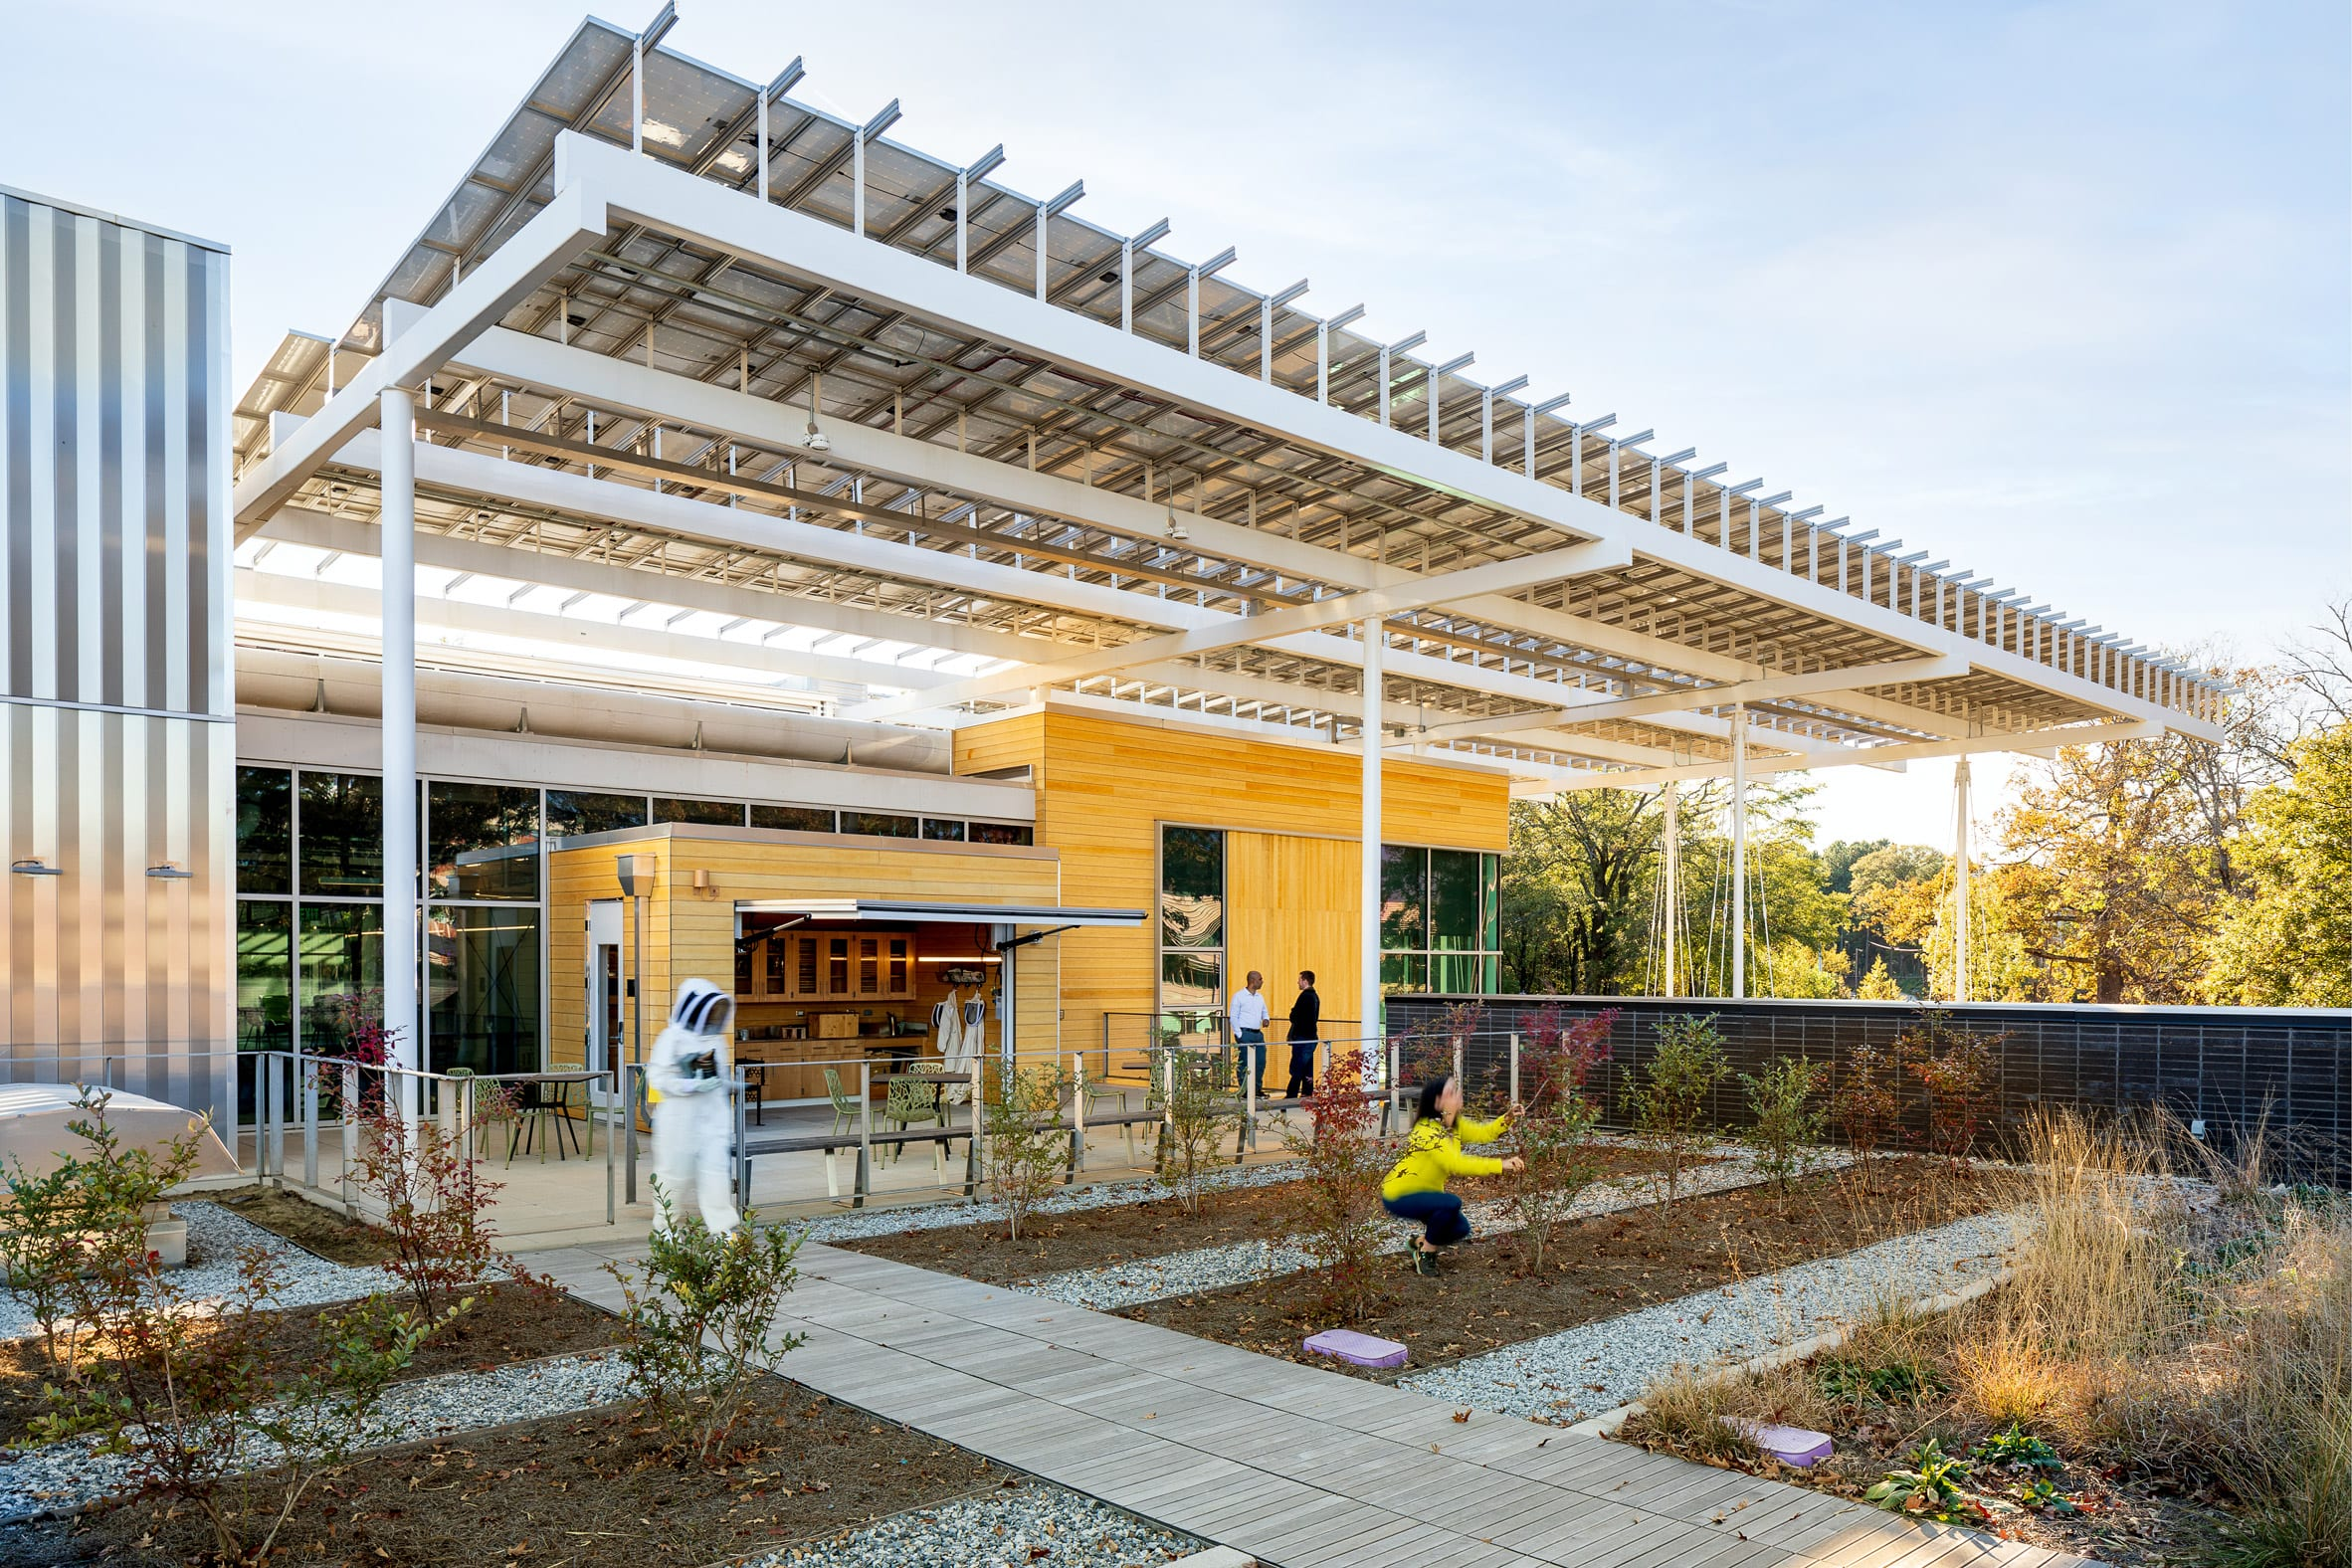 The Kendeda Building has a rooftop garden for beekeeping